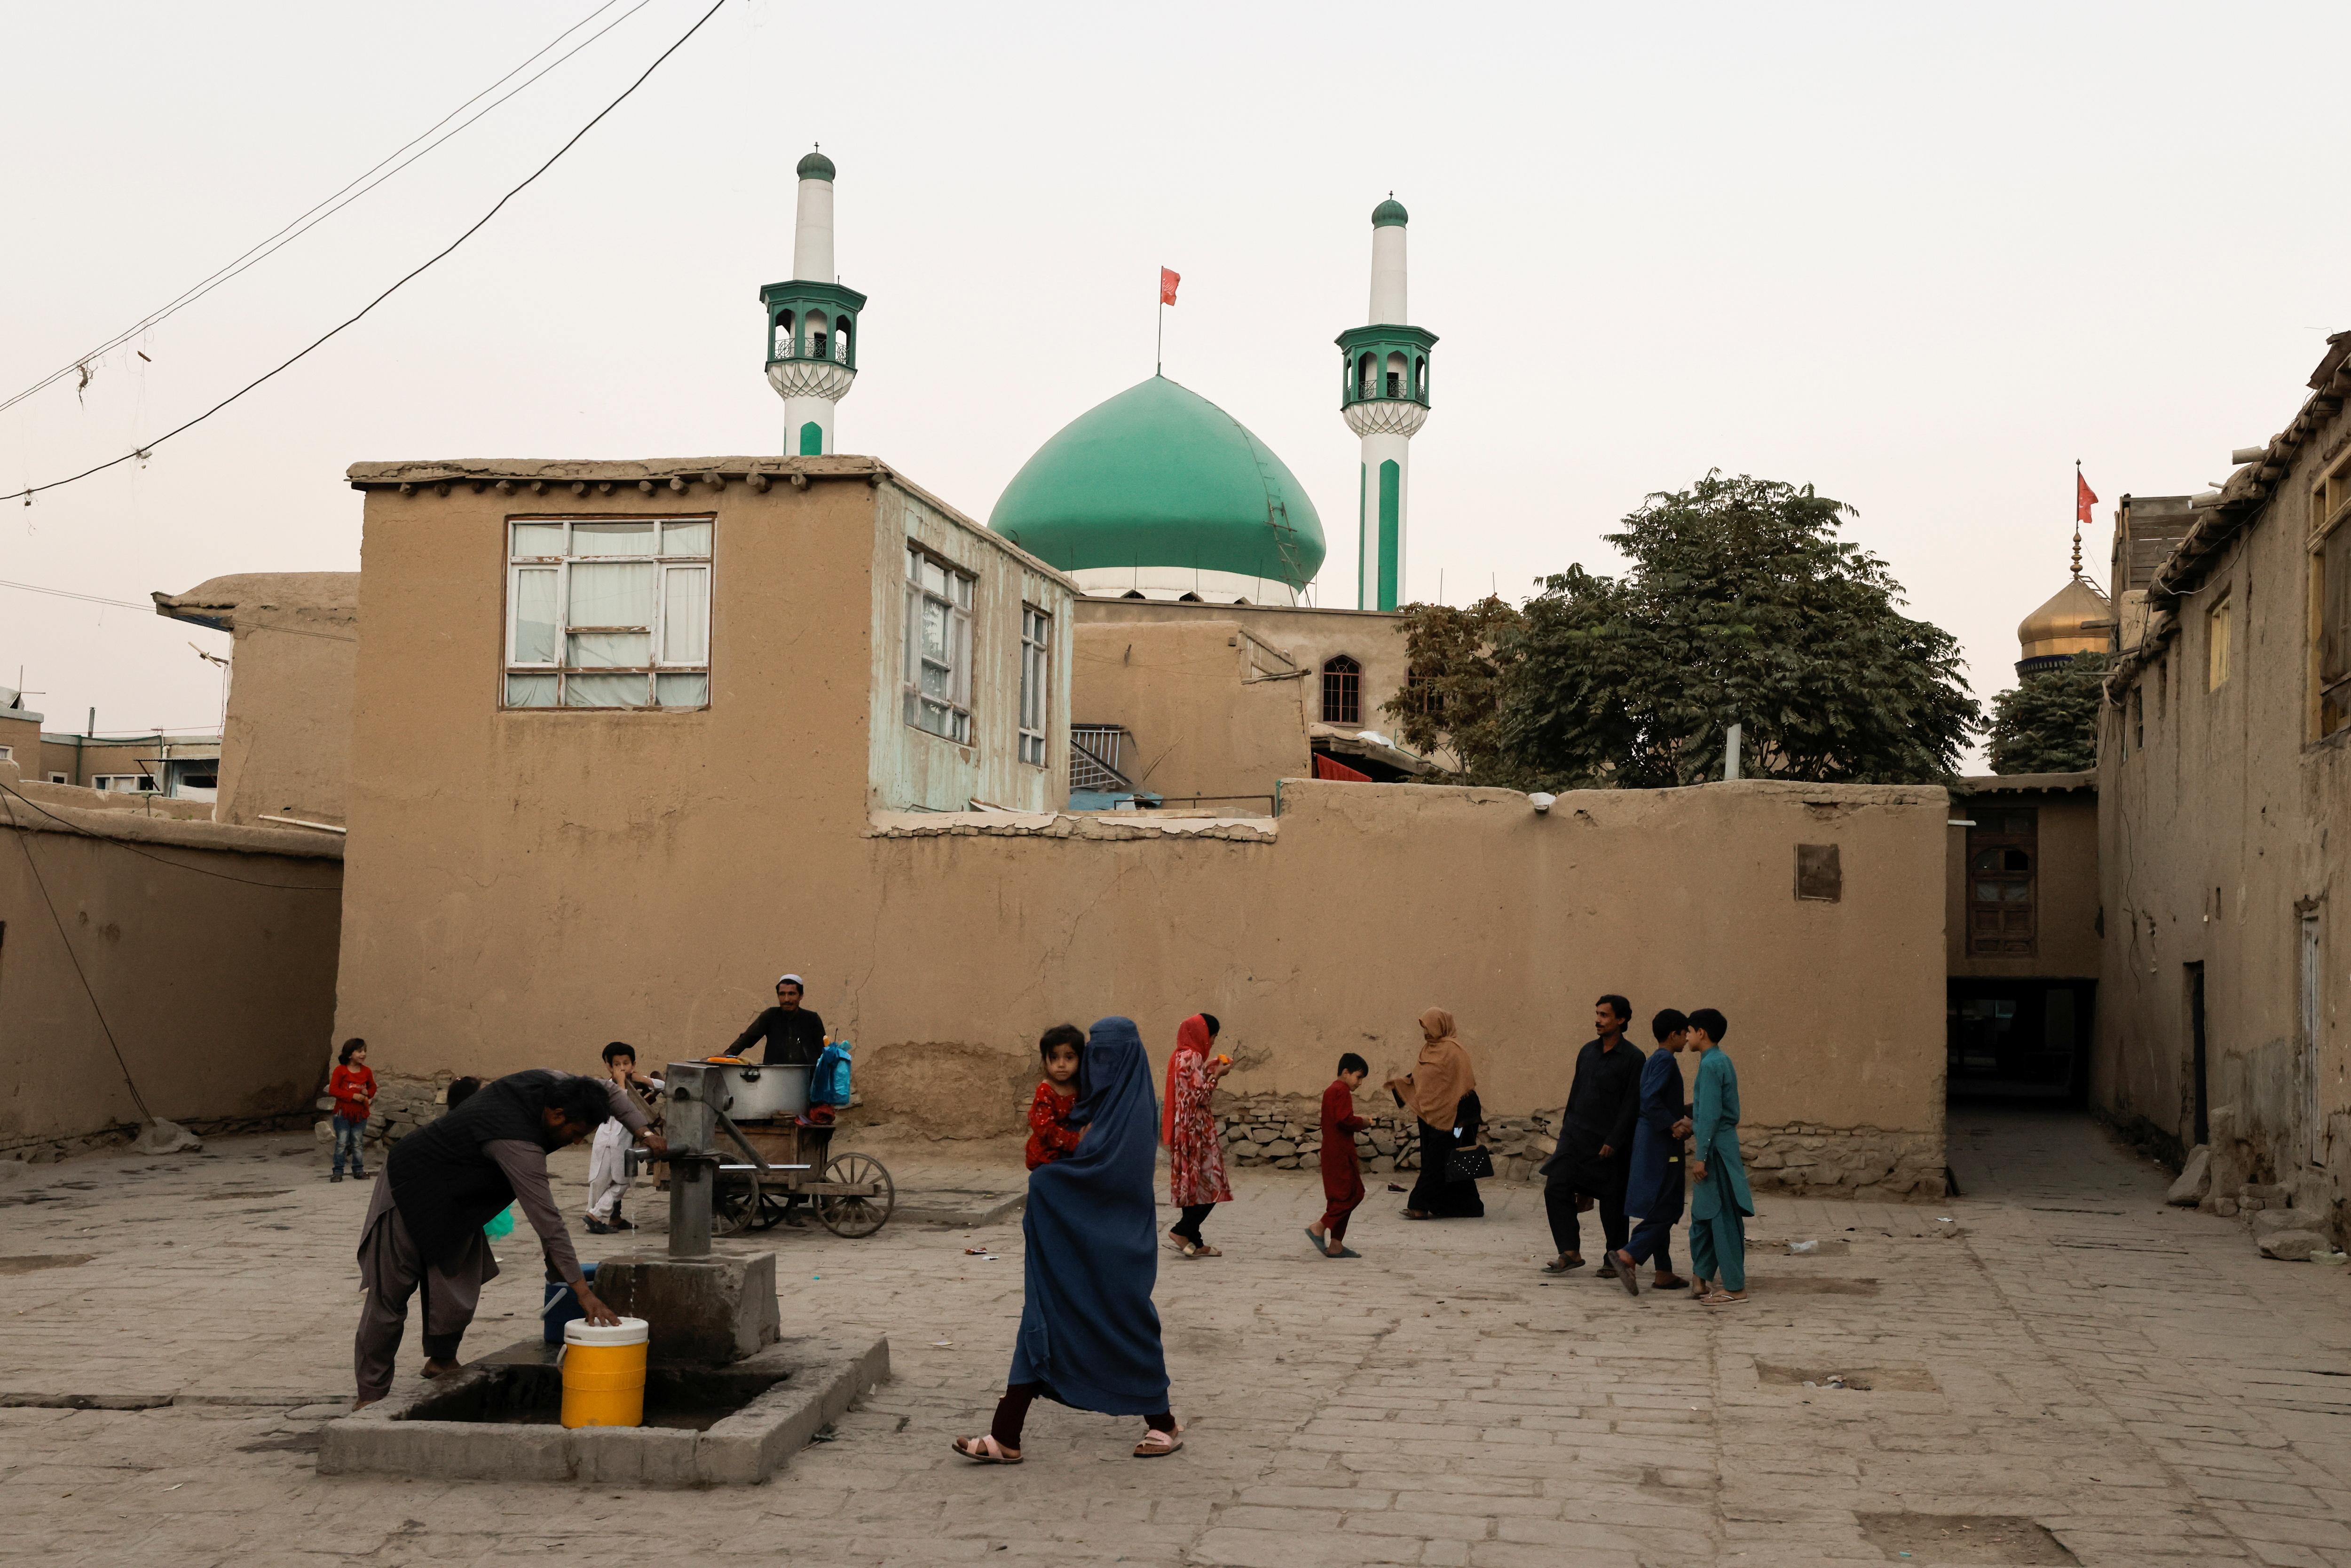 People walks in a square of an old neighborhood of Kabul, Afghanistan October 5, 2021. REUTERS/Jorge Silva